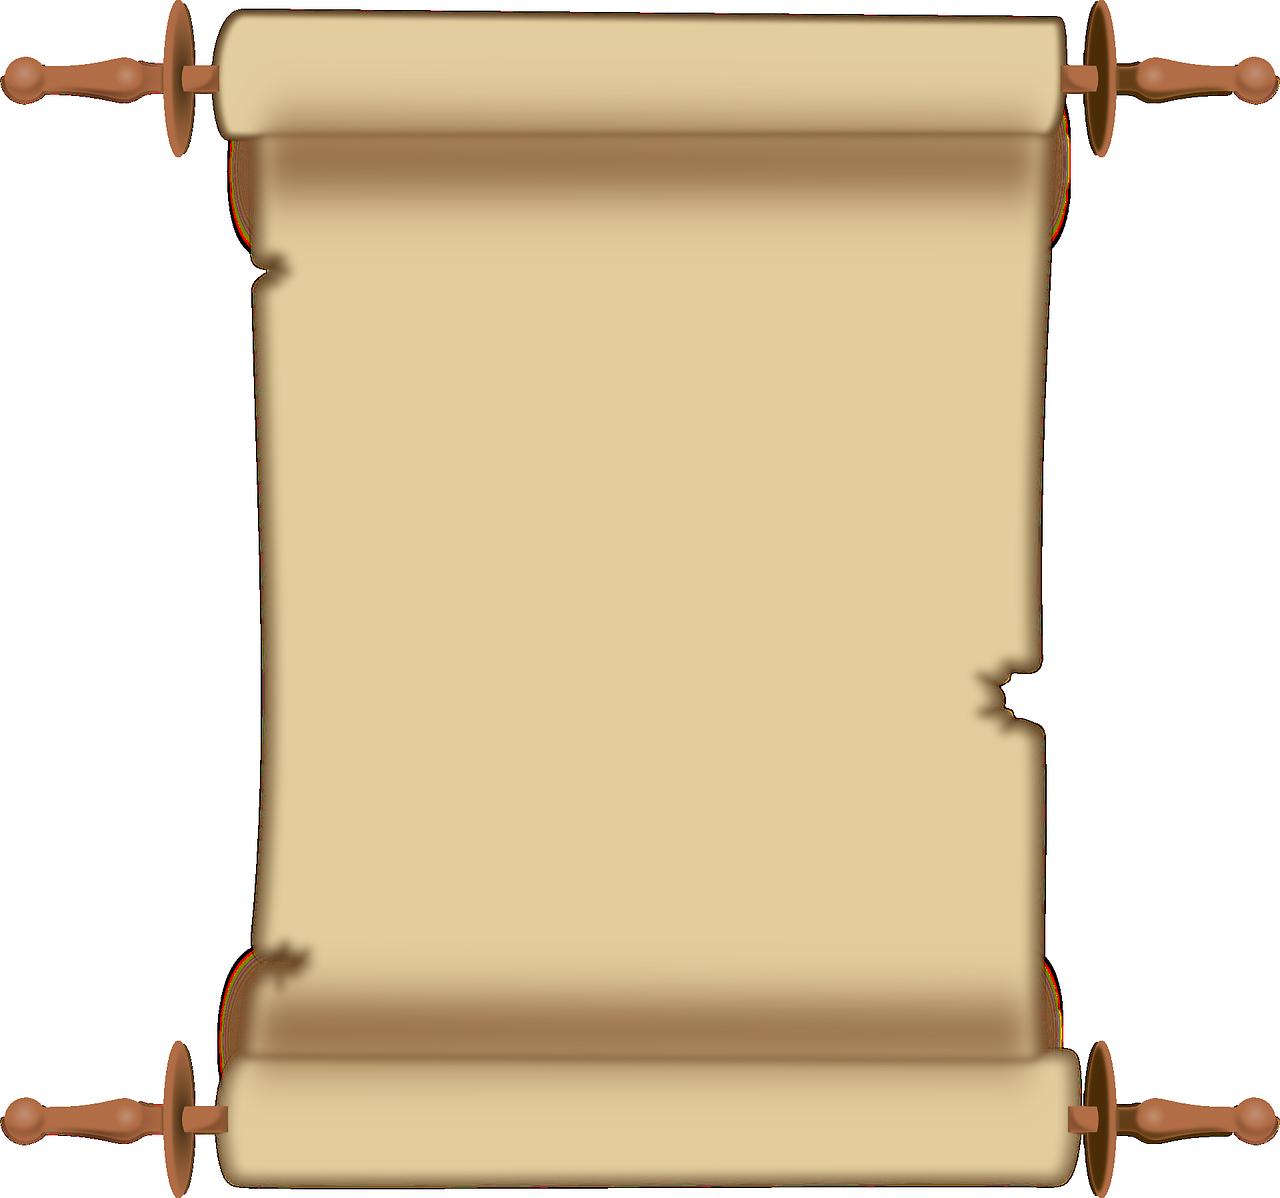 Document clipart papyrus scroll. Gratis afbeelding op pixabay